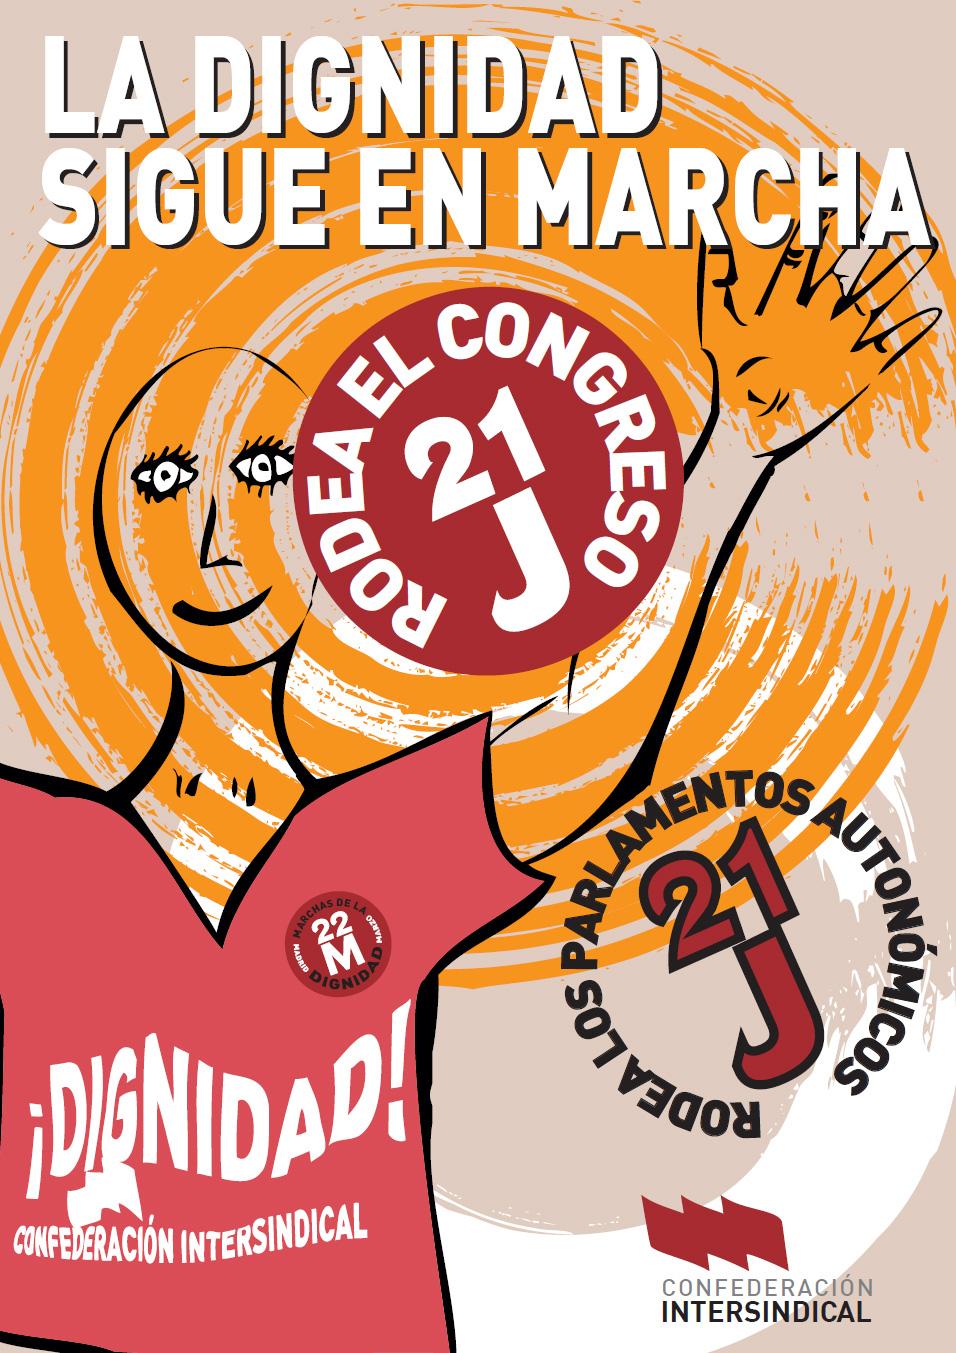 22M-MarchaDignidad_21Junio